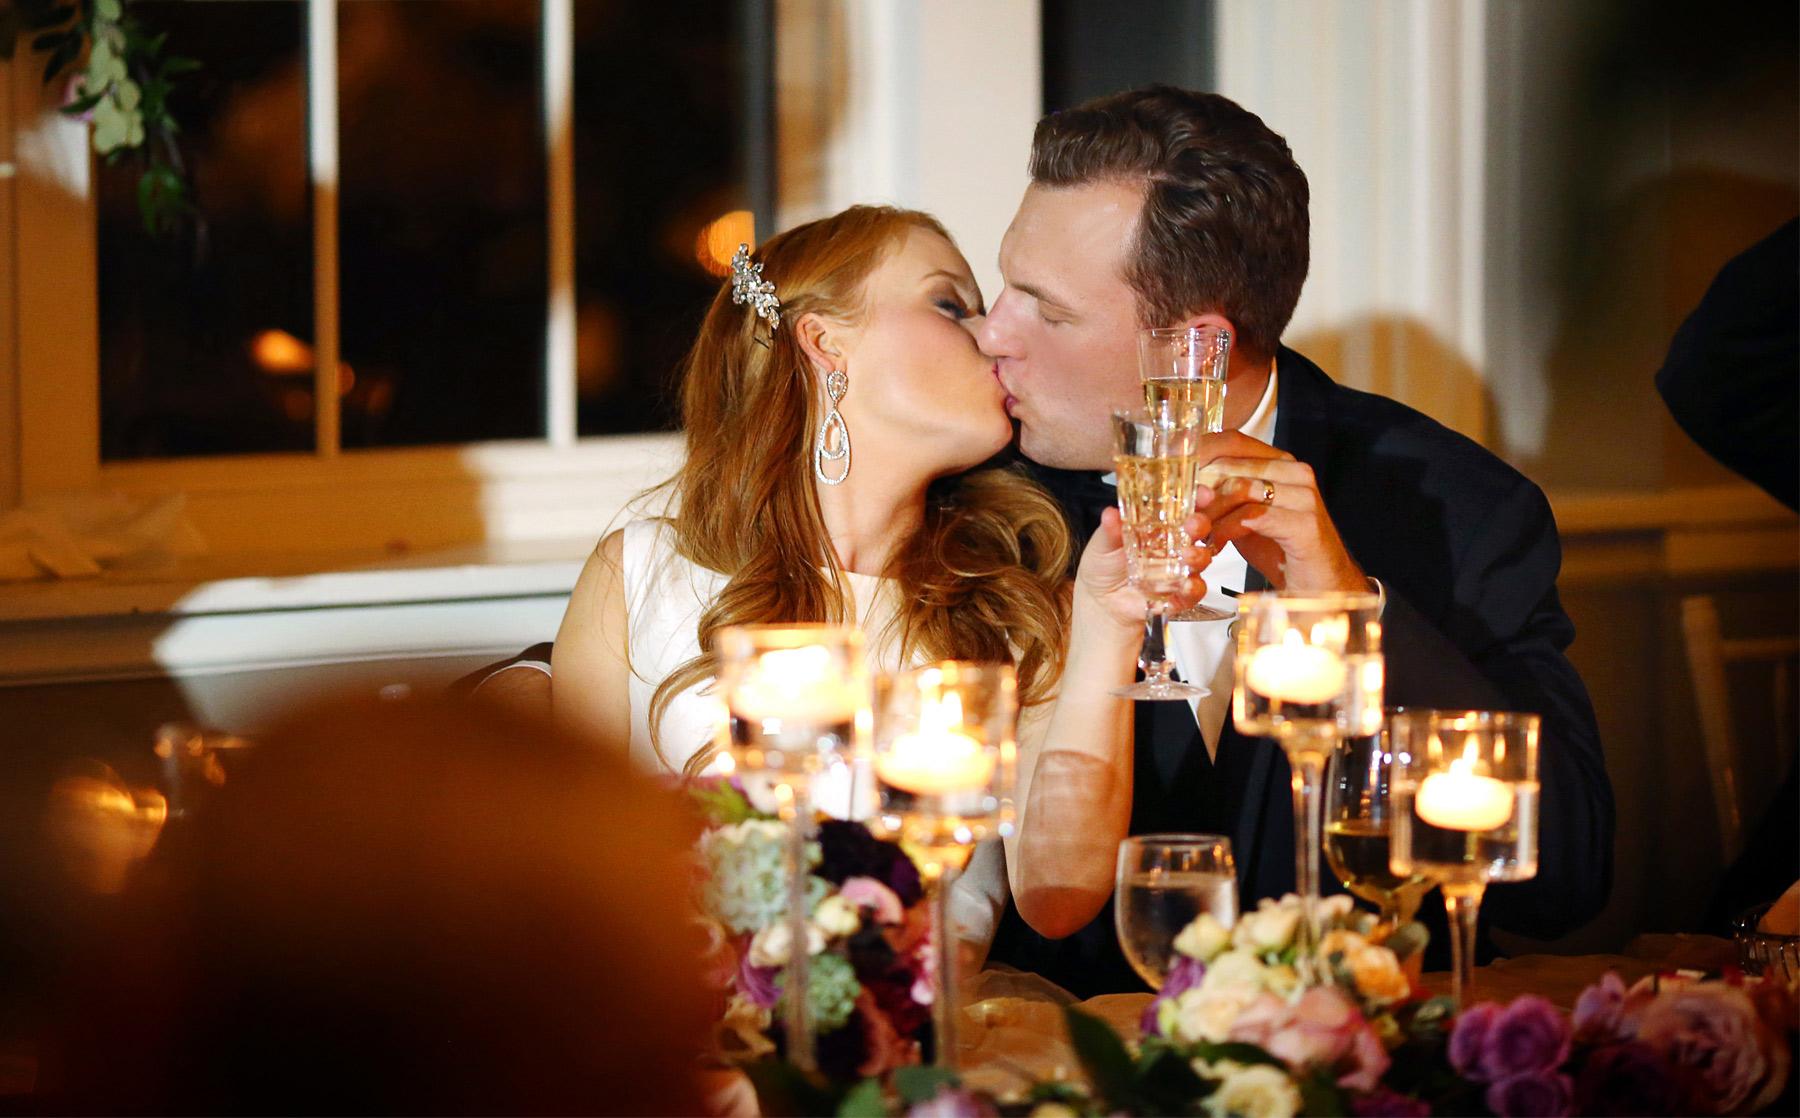 30-Minneapolis-Minnesota-Wedding-Photographer-by-Andrew-Vick-Photography-Fall-Autumn-Calhoun-Beach-Club-Reception-Bride-Groom-Kiss-Champagne-Kristy-and-Jack.jpg